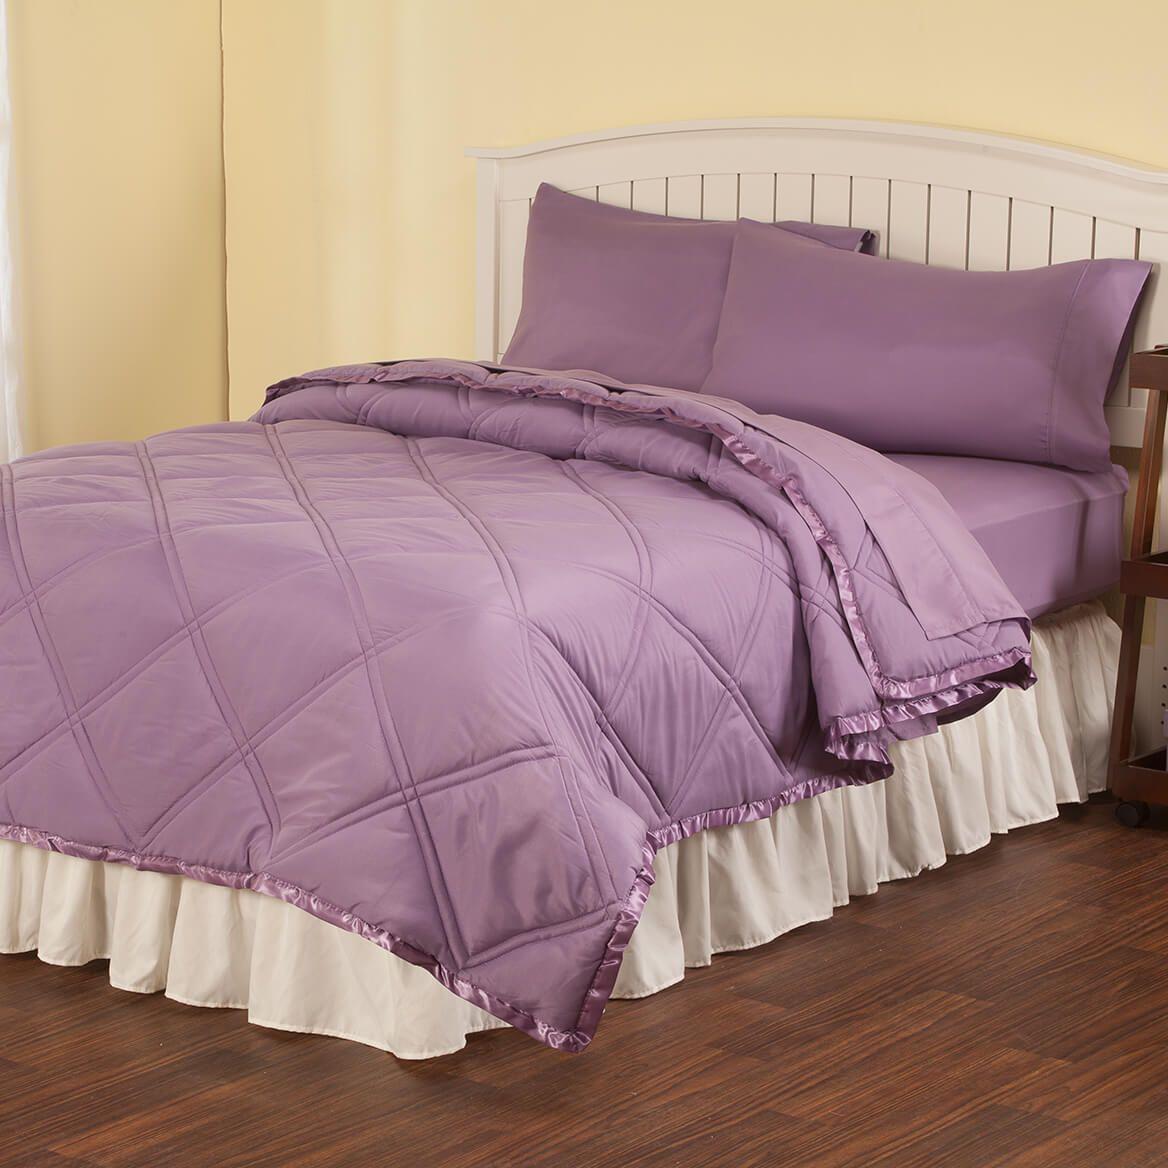 Microfiber Comforter and Sheet Set-364581